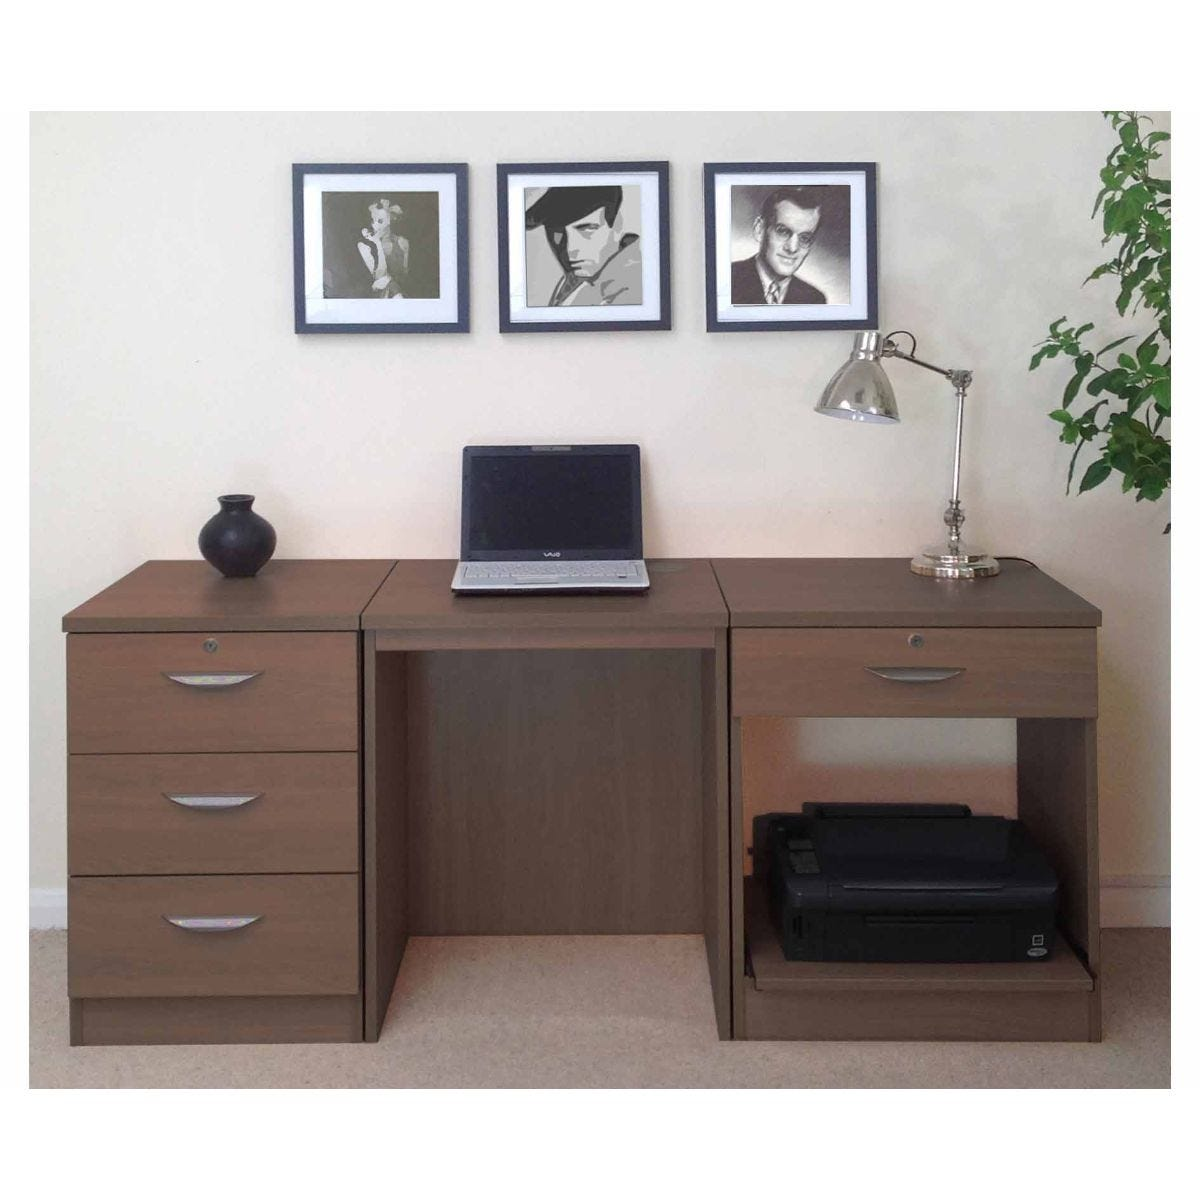 R White Home Office Furniture Desk Set, Teak Wood Grain